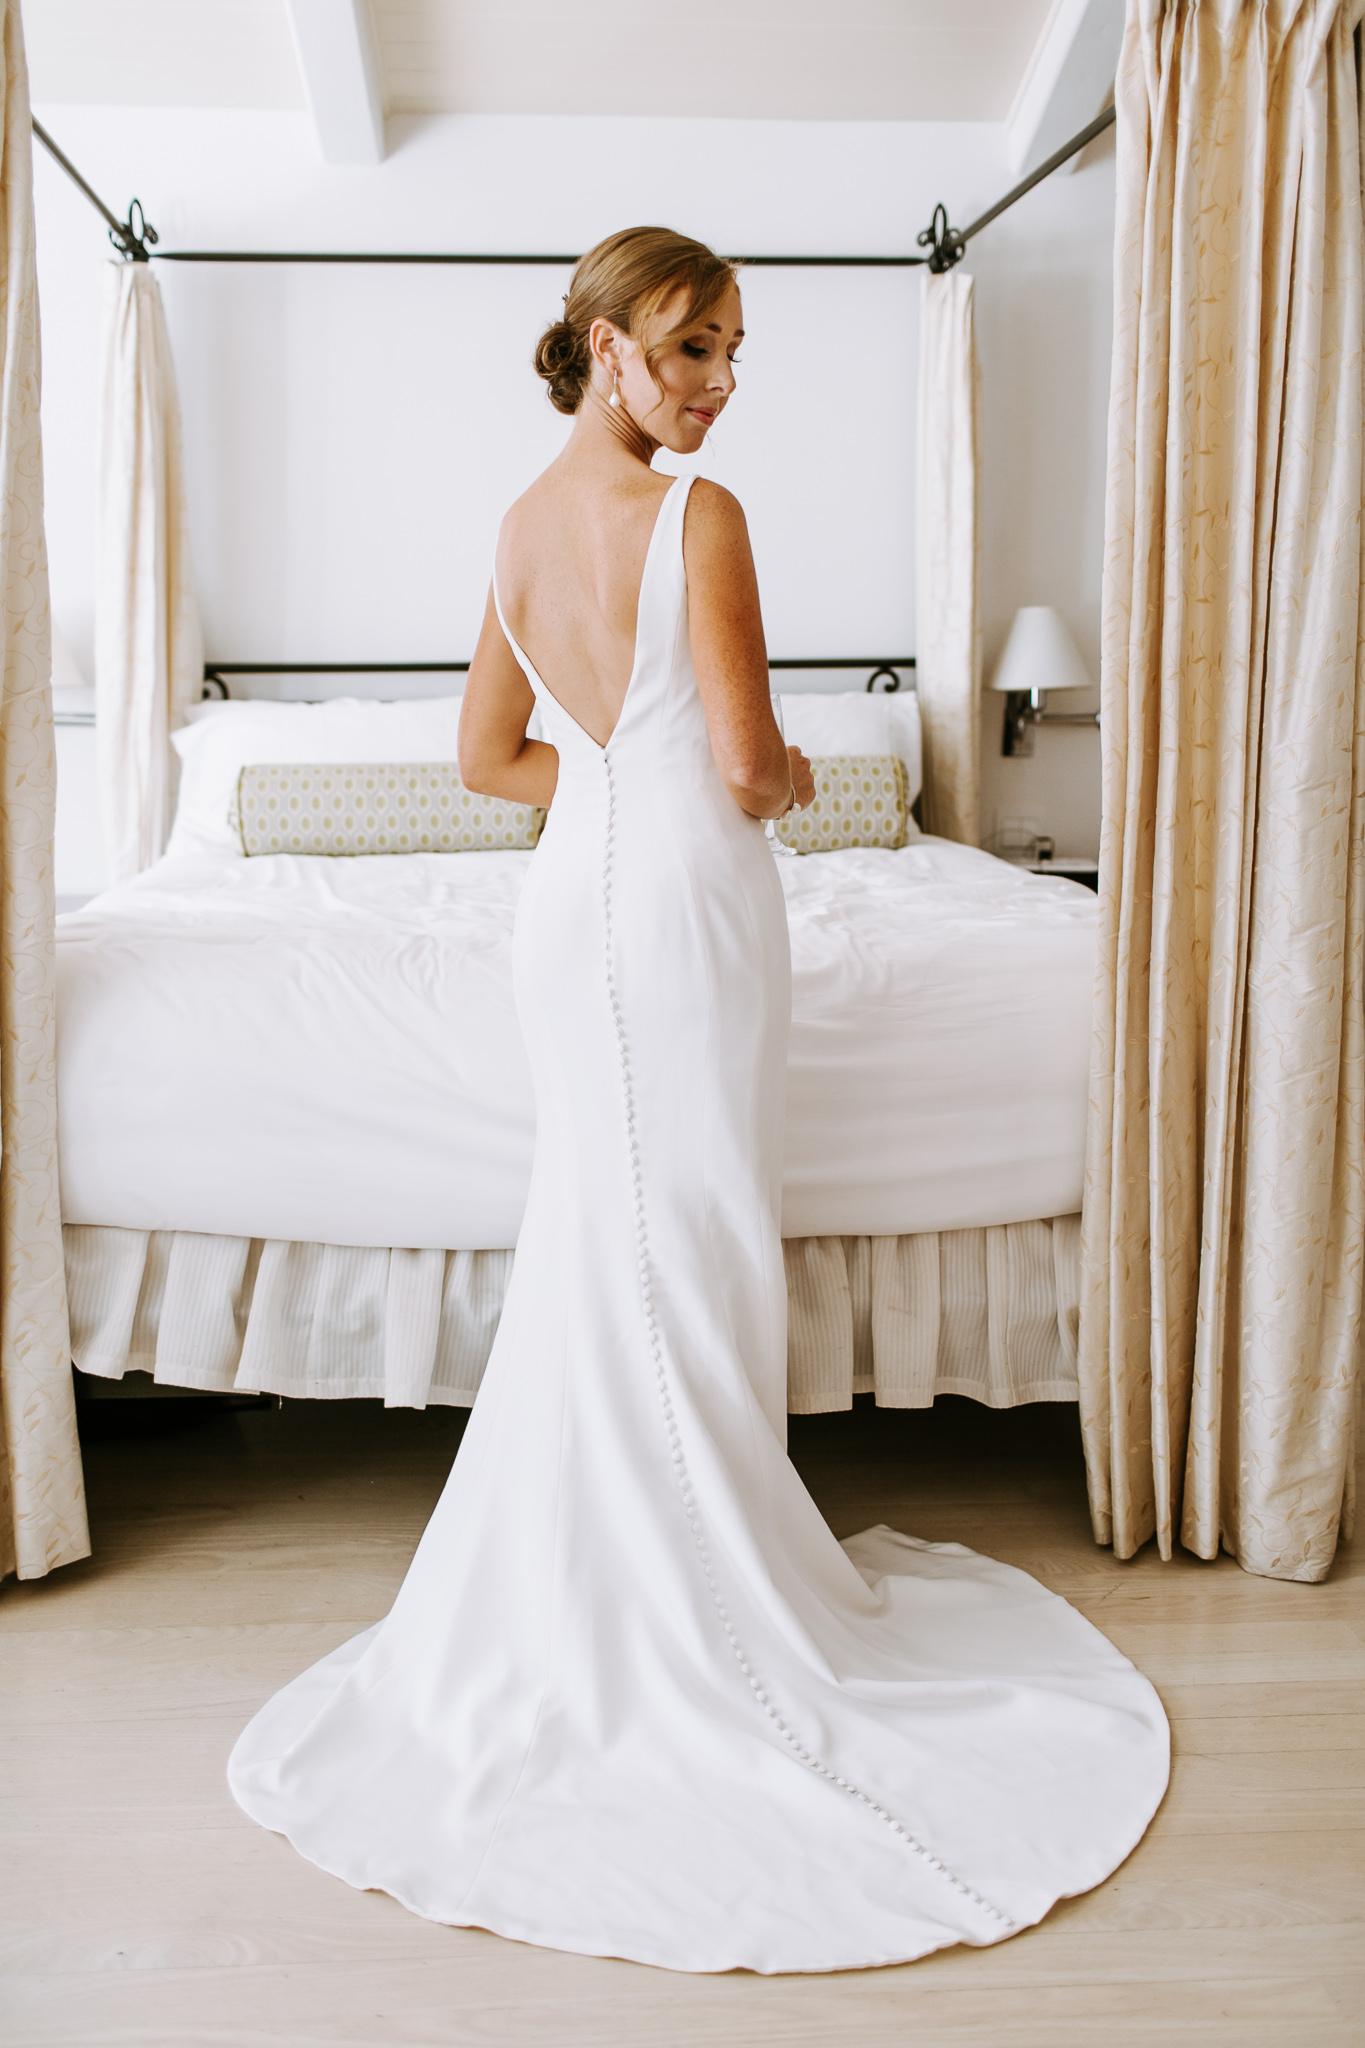 San-Diego-Wedding-Photographer-10.jpg